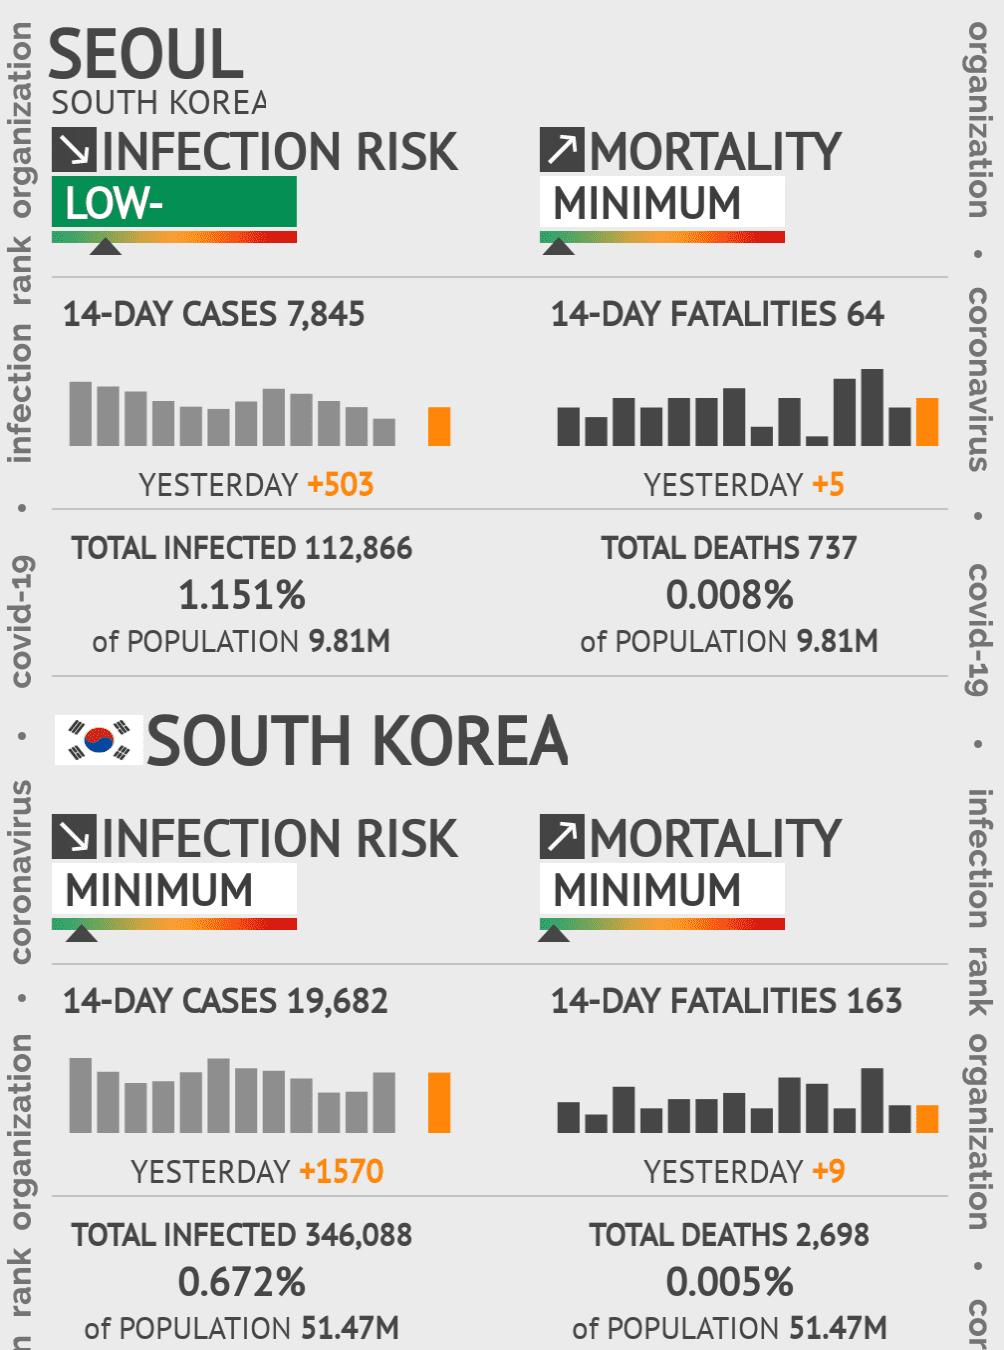 Seoul Coronavirus Covid-19 Risk of Infection on February 28, 2021